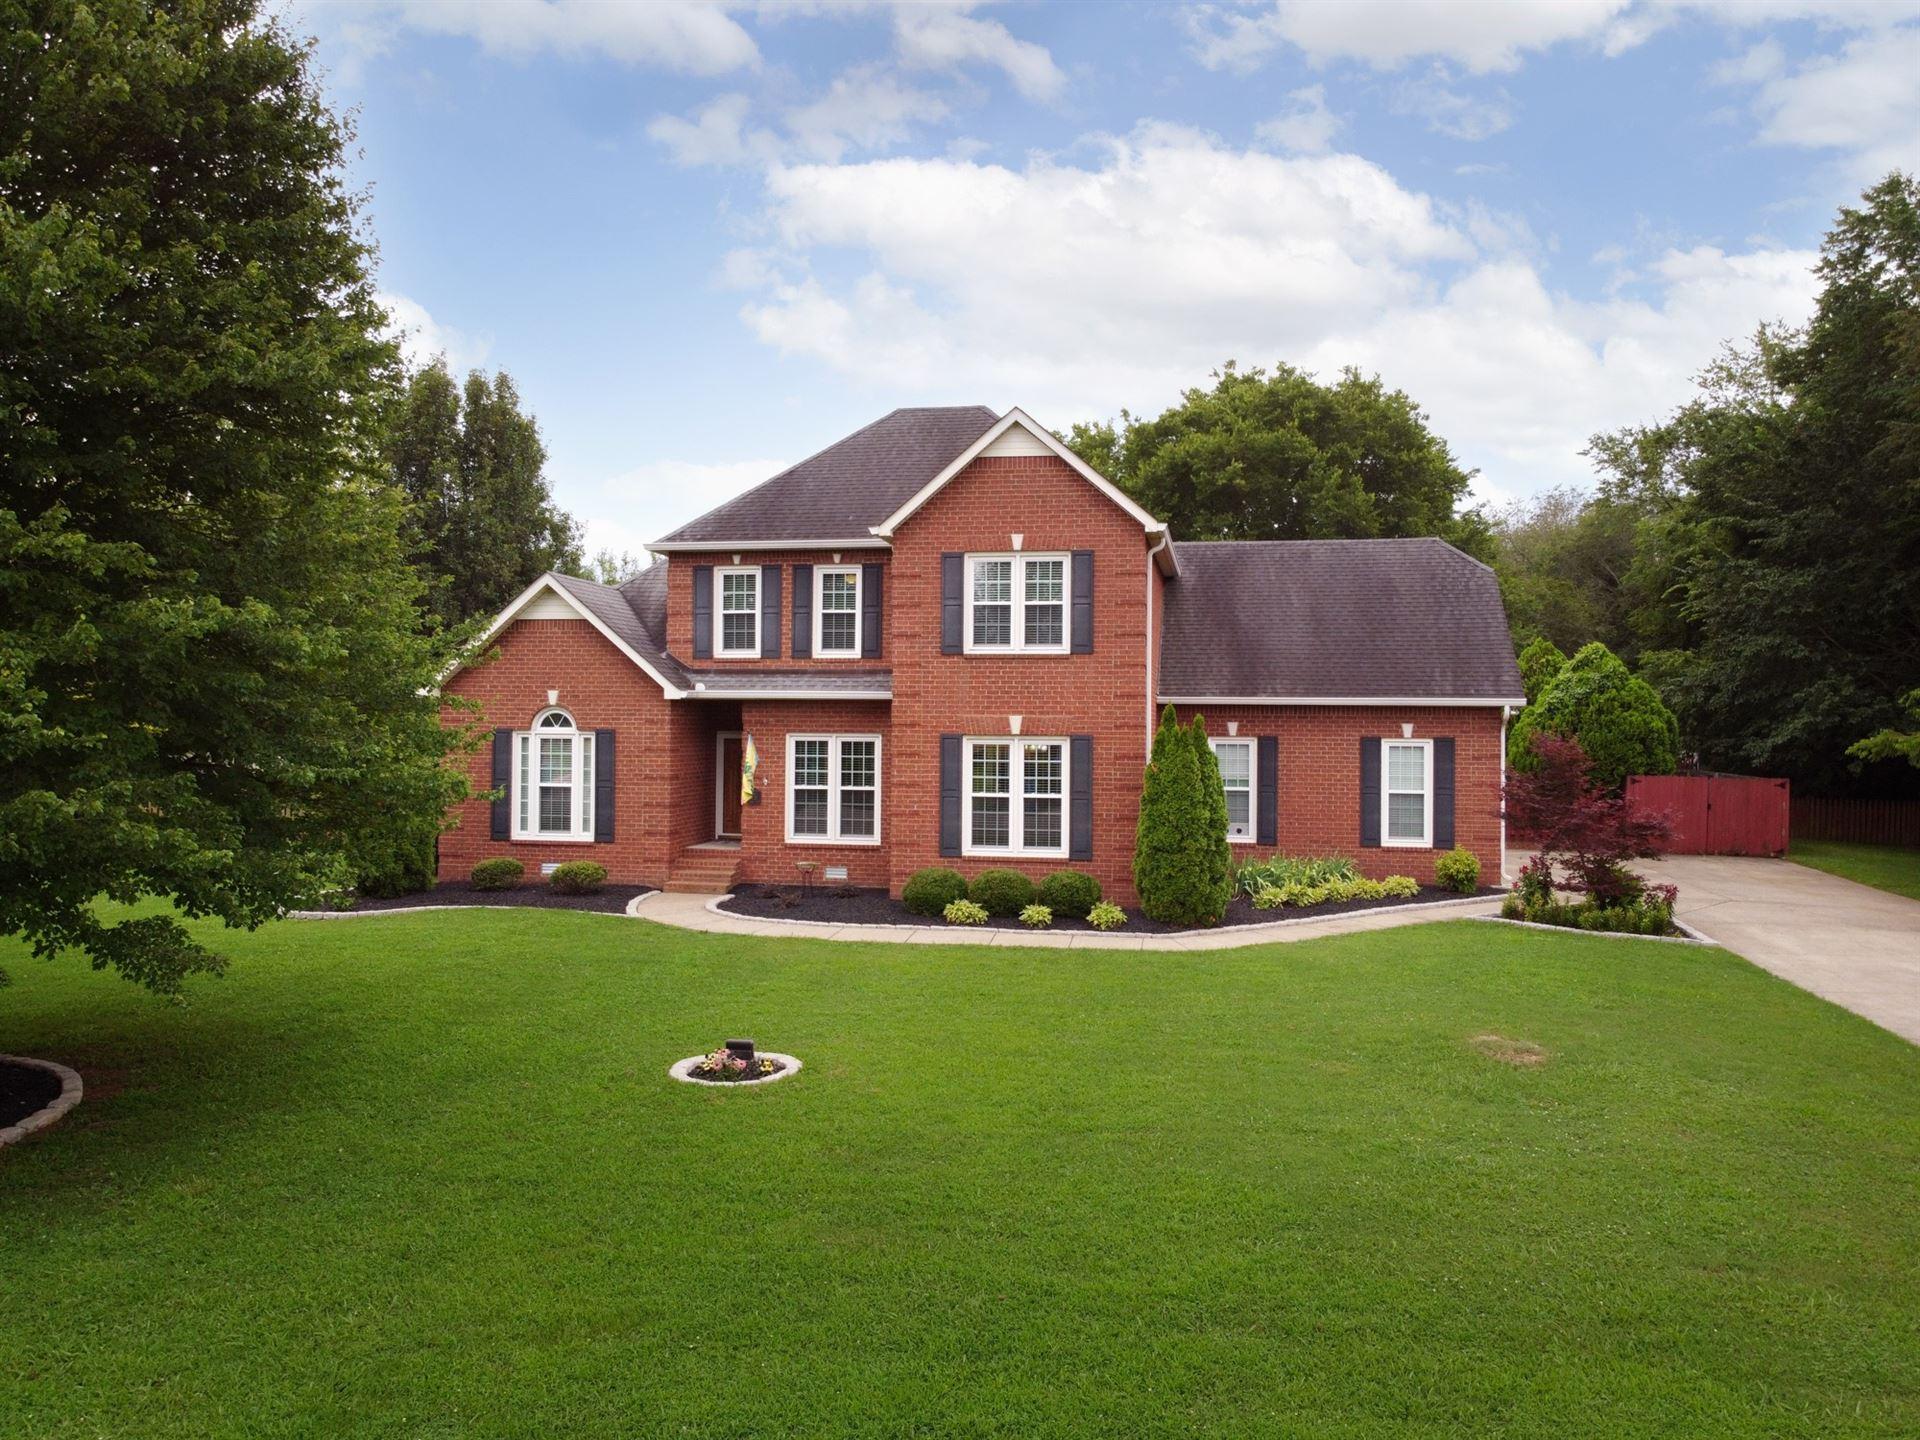 105 Noble Ct, Murfreesboro, TN 37128 - MLS#: 2274976